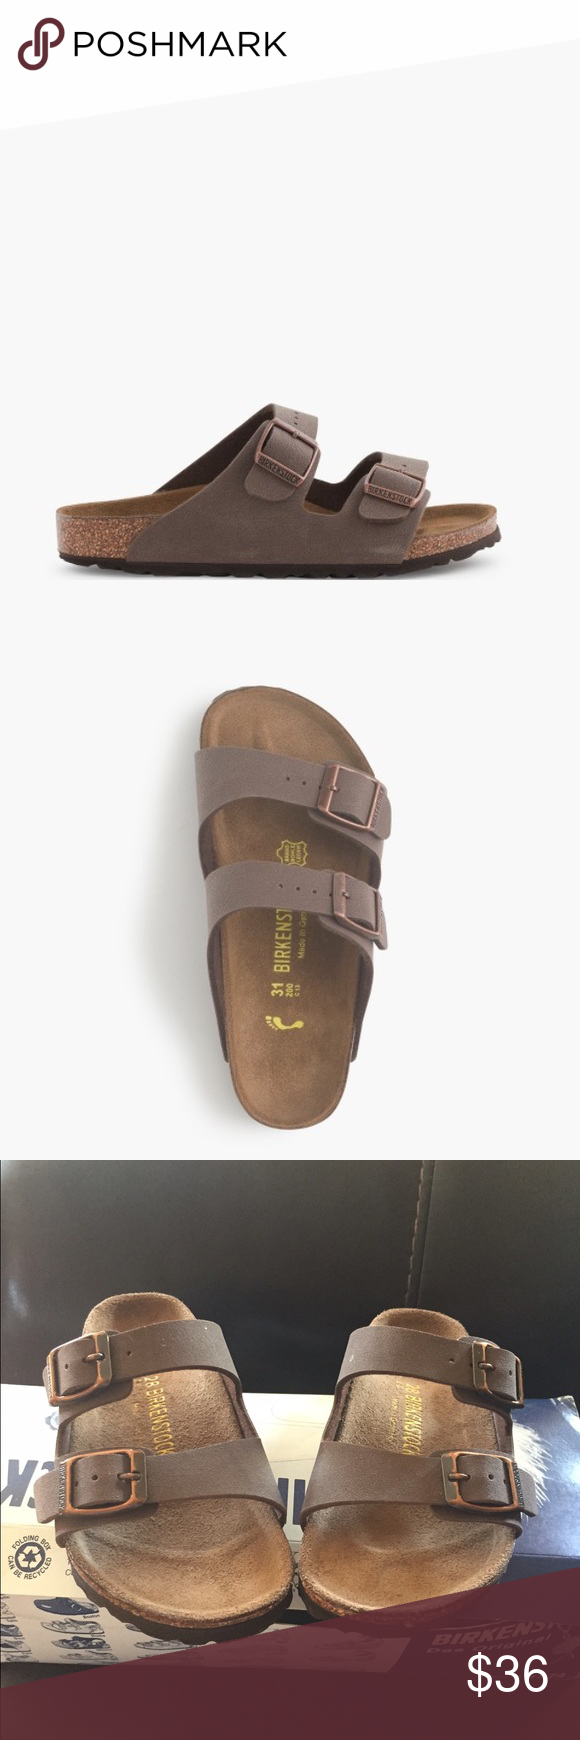 Kids Birkenstock size 10c Unisex Arizona sandal, Birkenstock brand new never used . Size 10c /28 Birkenstock Shoes Sandals & Flip Flops